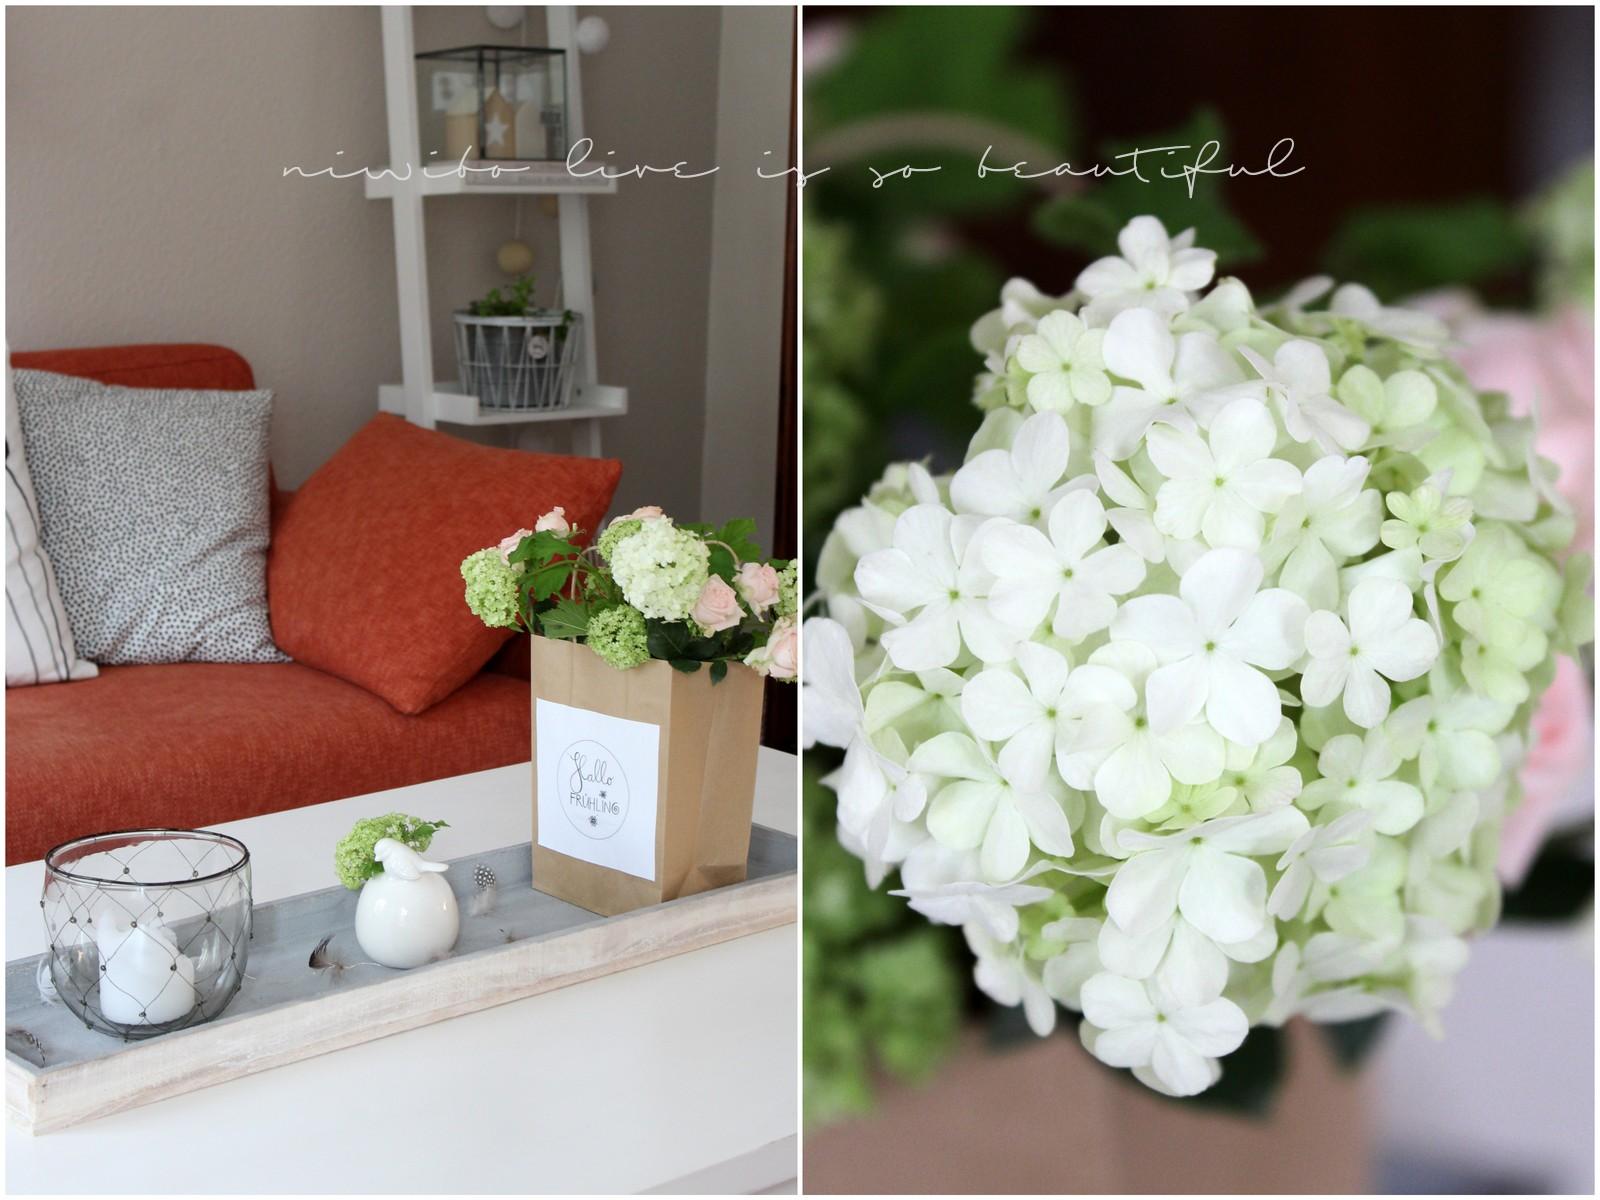 niwibo life is so beautiful. Black Bedroom Furniture Sets. Home Design Ideas